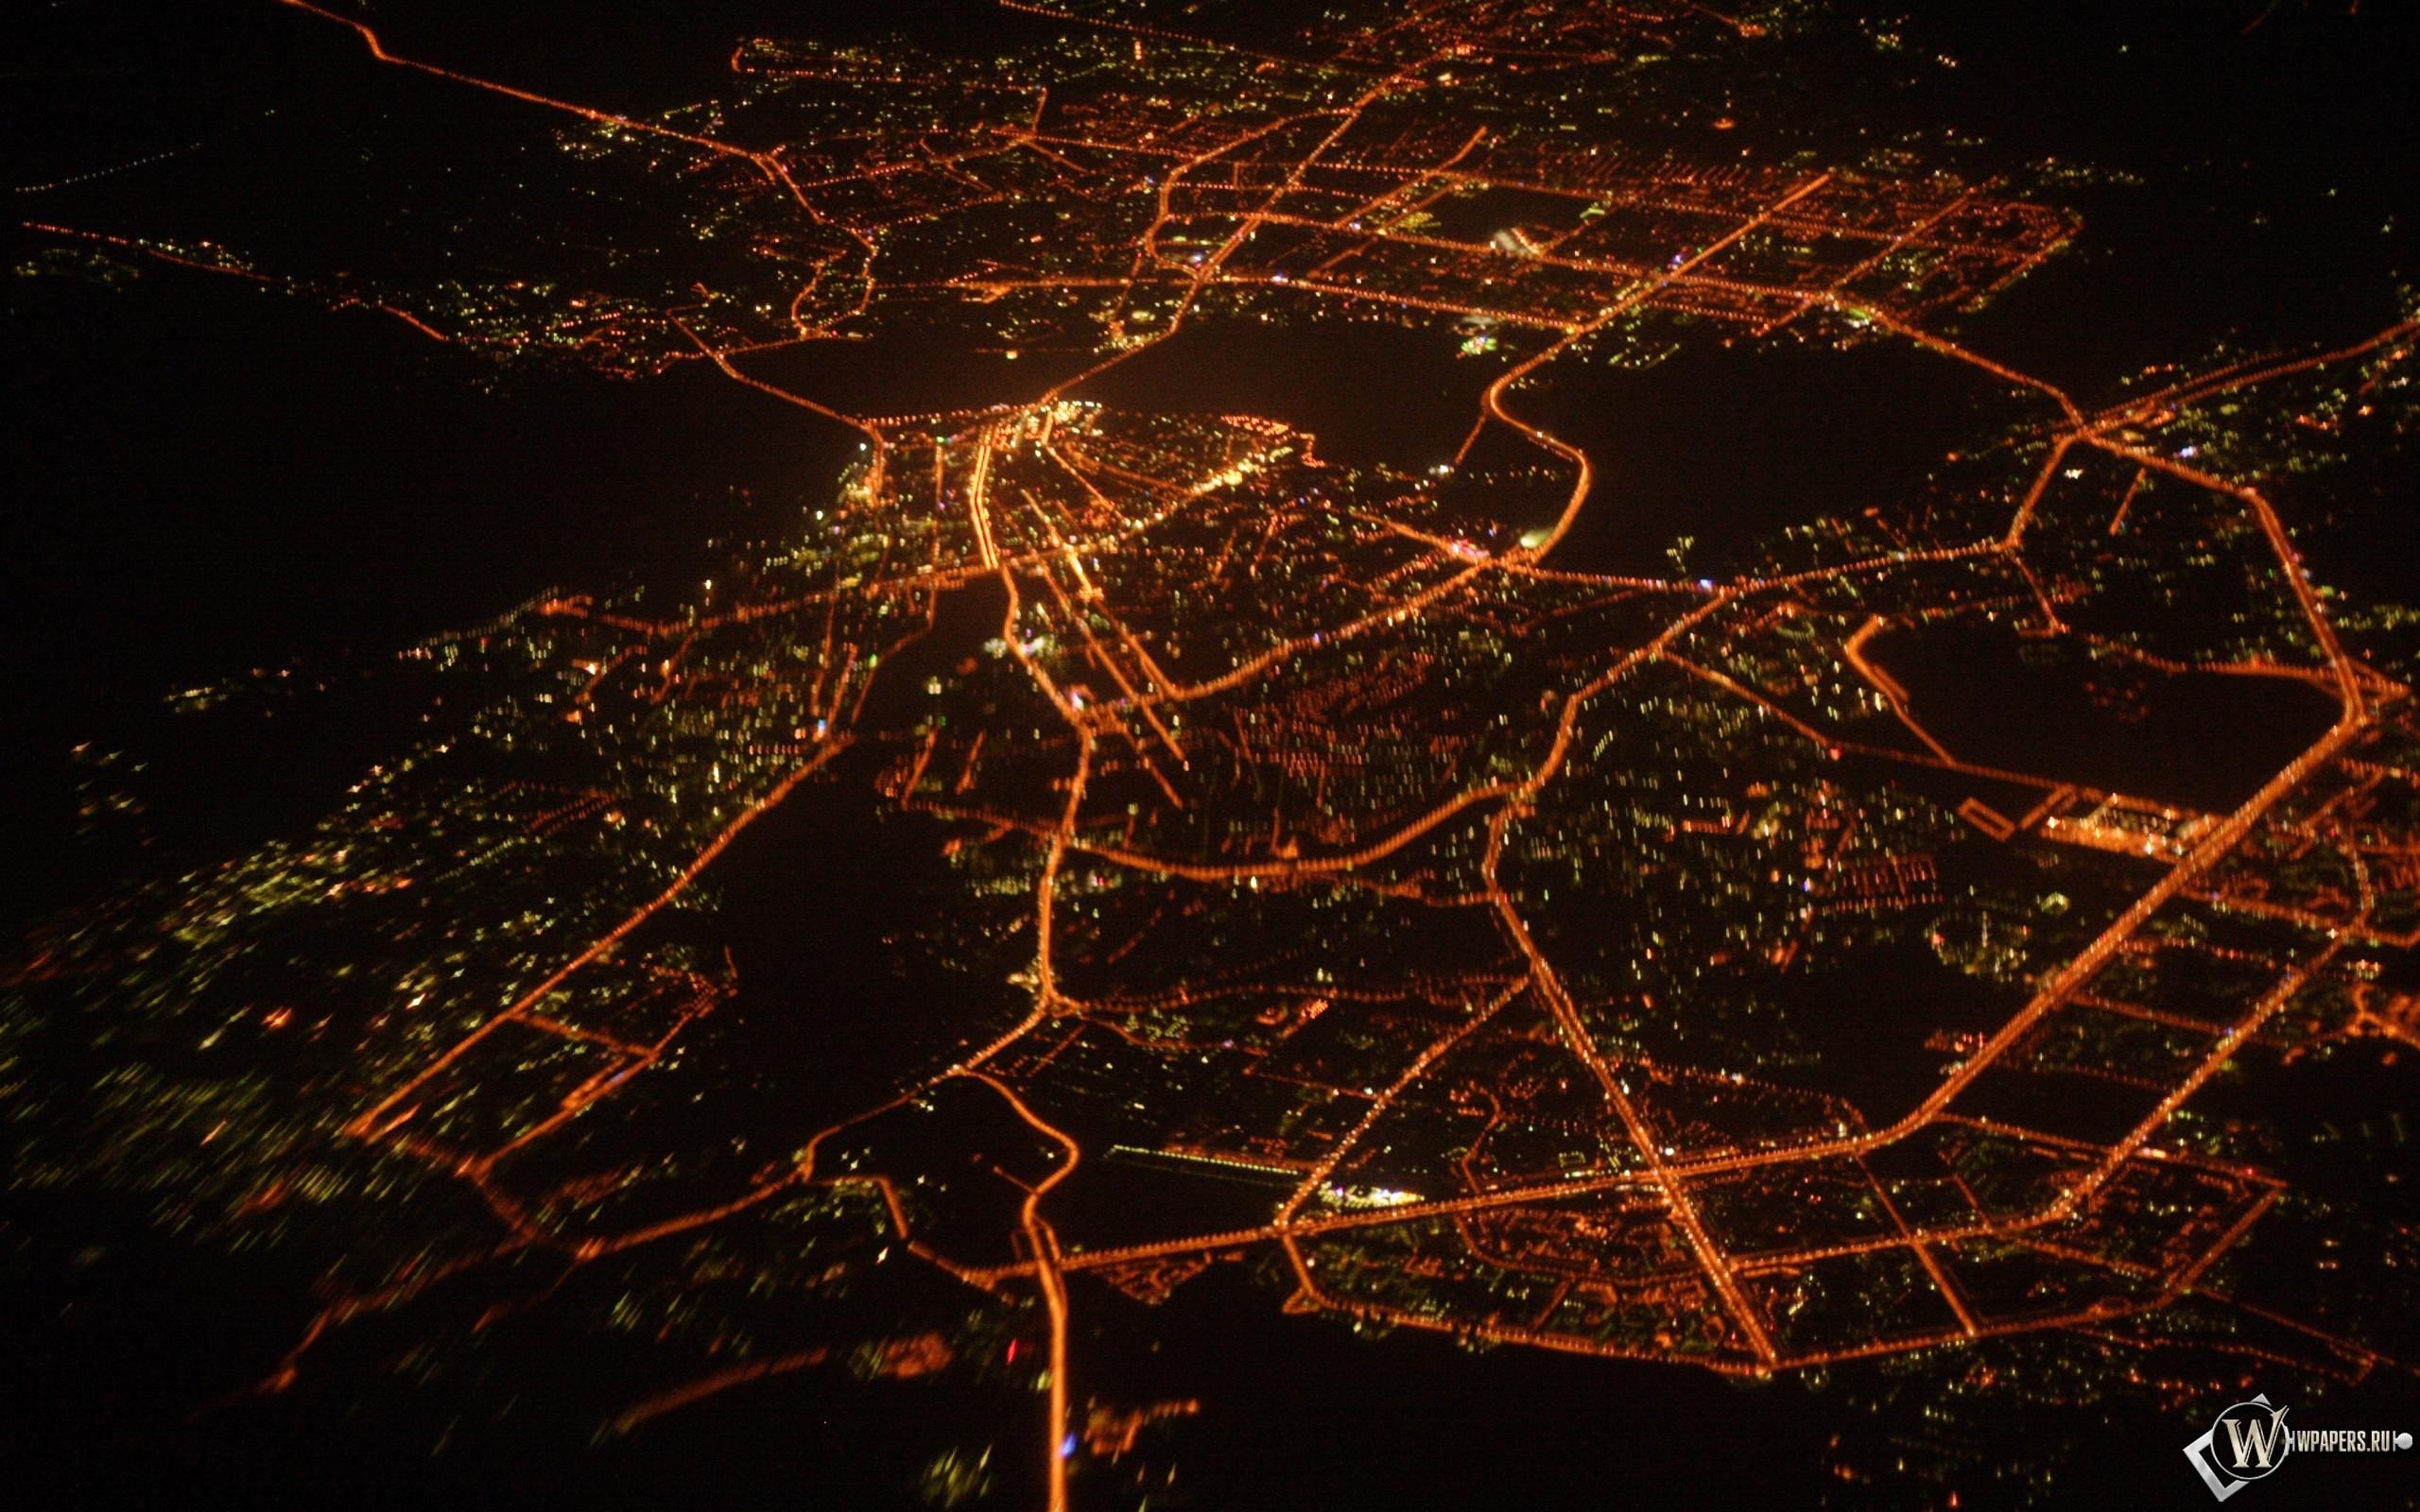 Ночная казань (вид сверху) 2560x1600